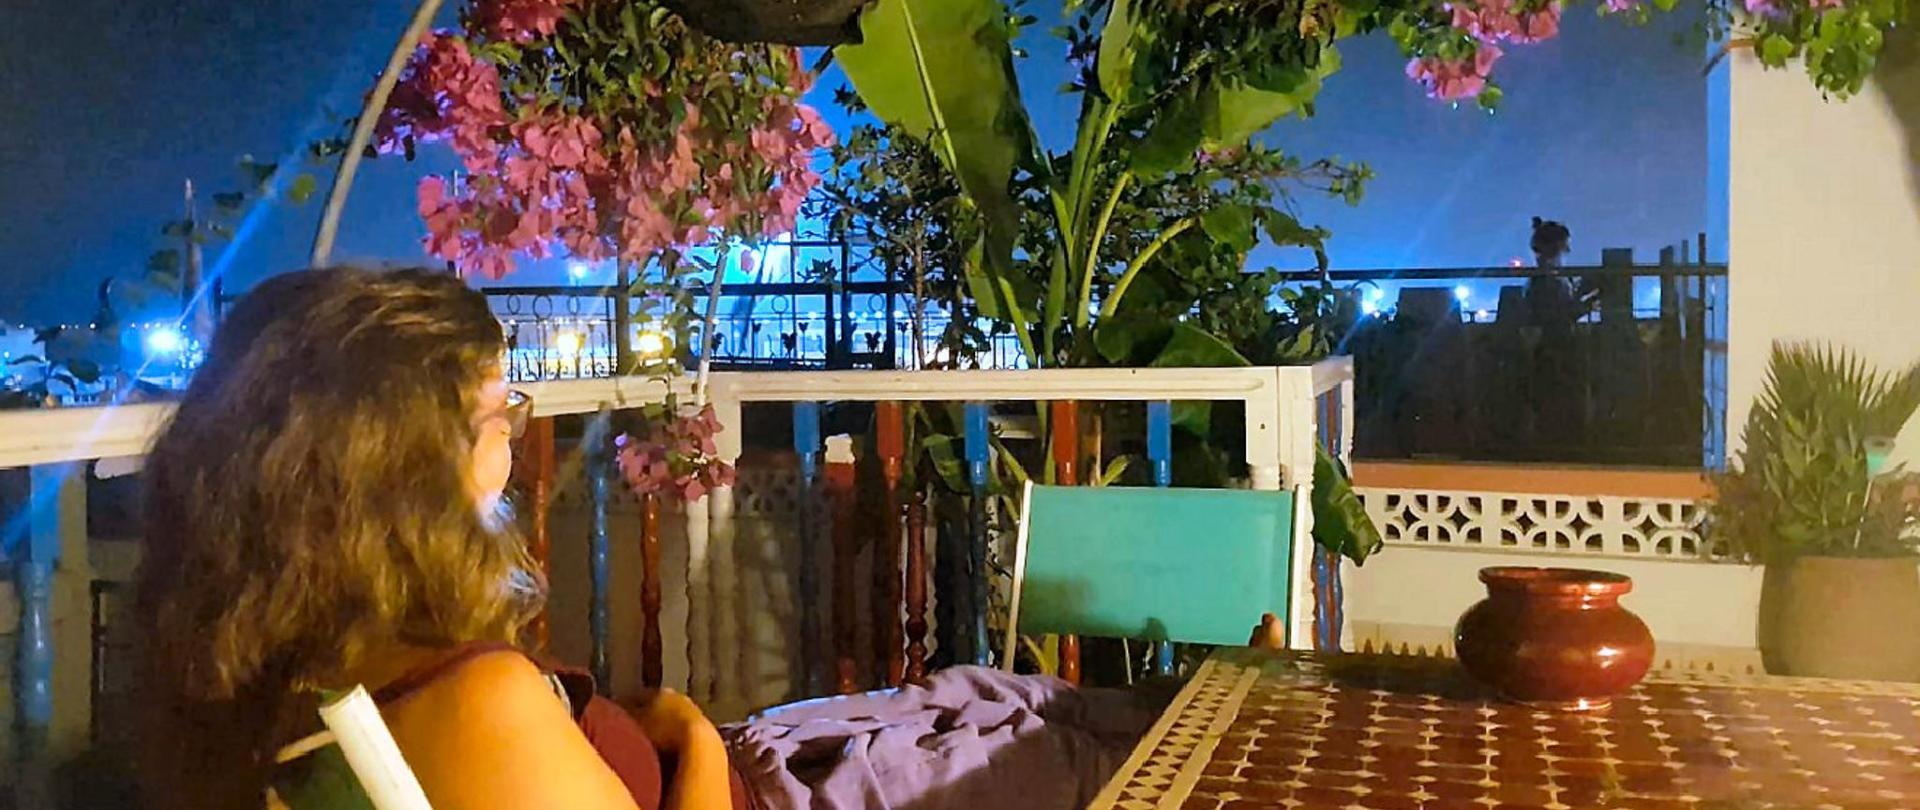 terrasse nuit 08 2019.jpg